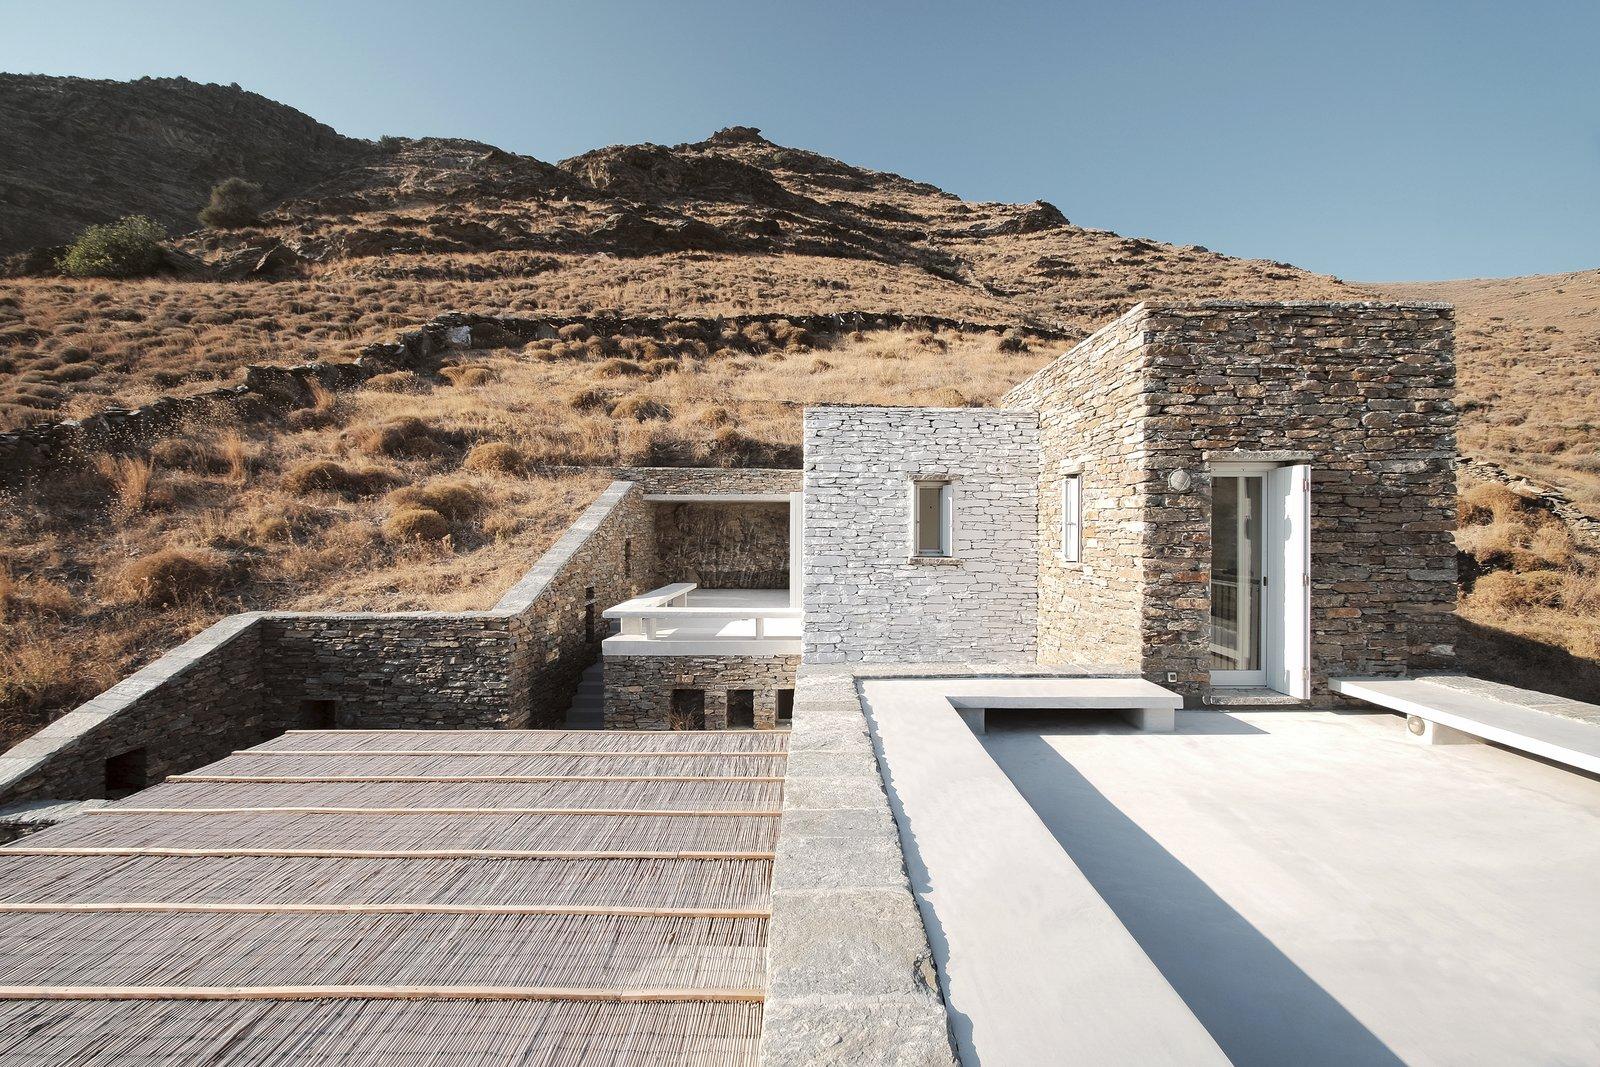 Double terrace views  ROCKSPLIT house by COMETA ARCHITECTS